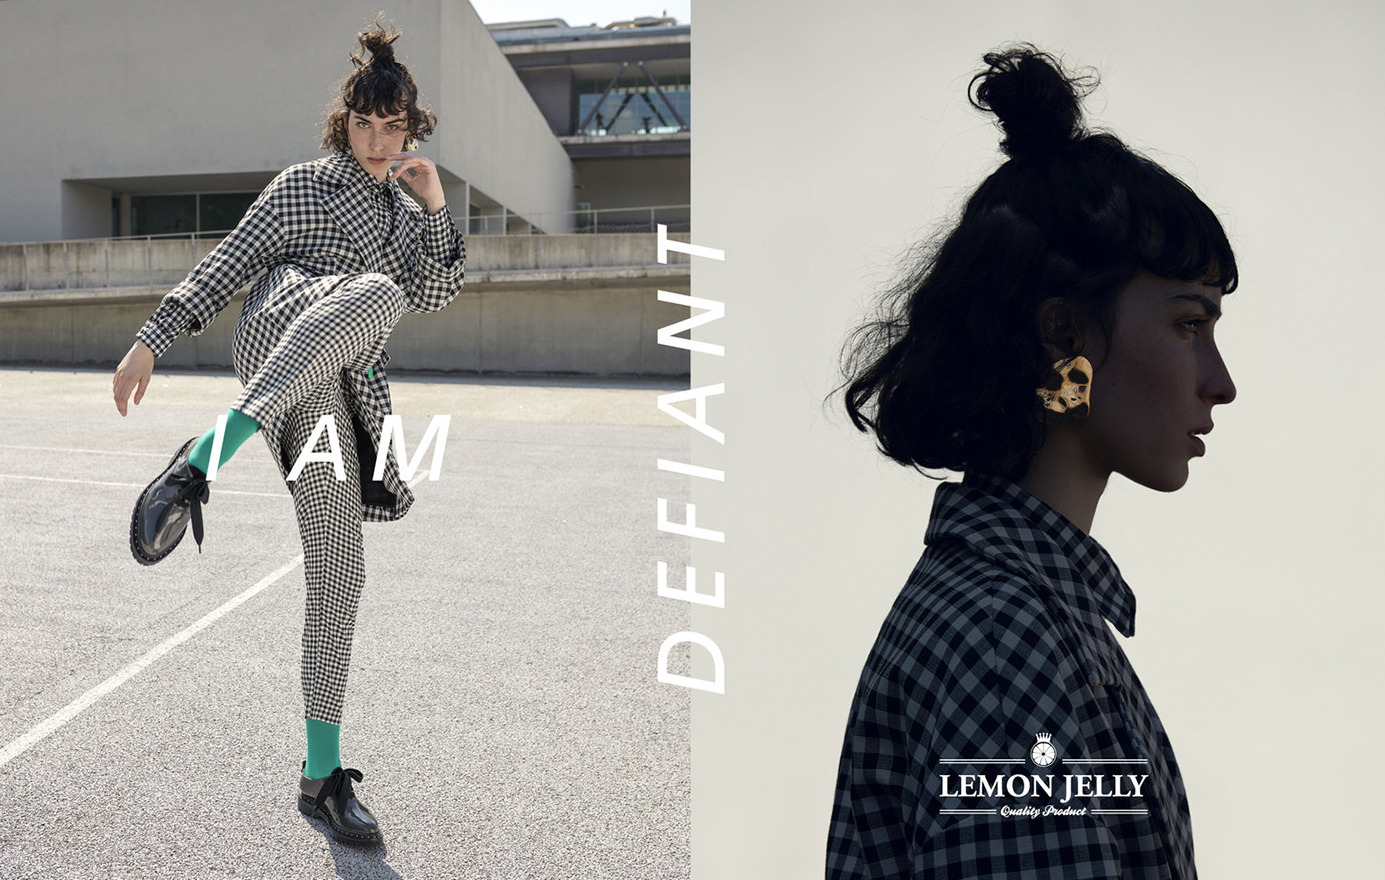 Helena-Almeida-Lemon-Jelly-AW18-4.jpg